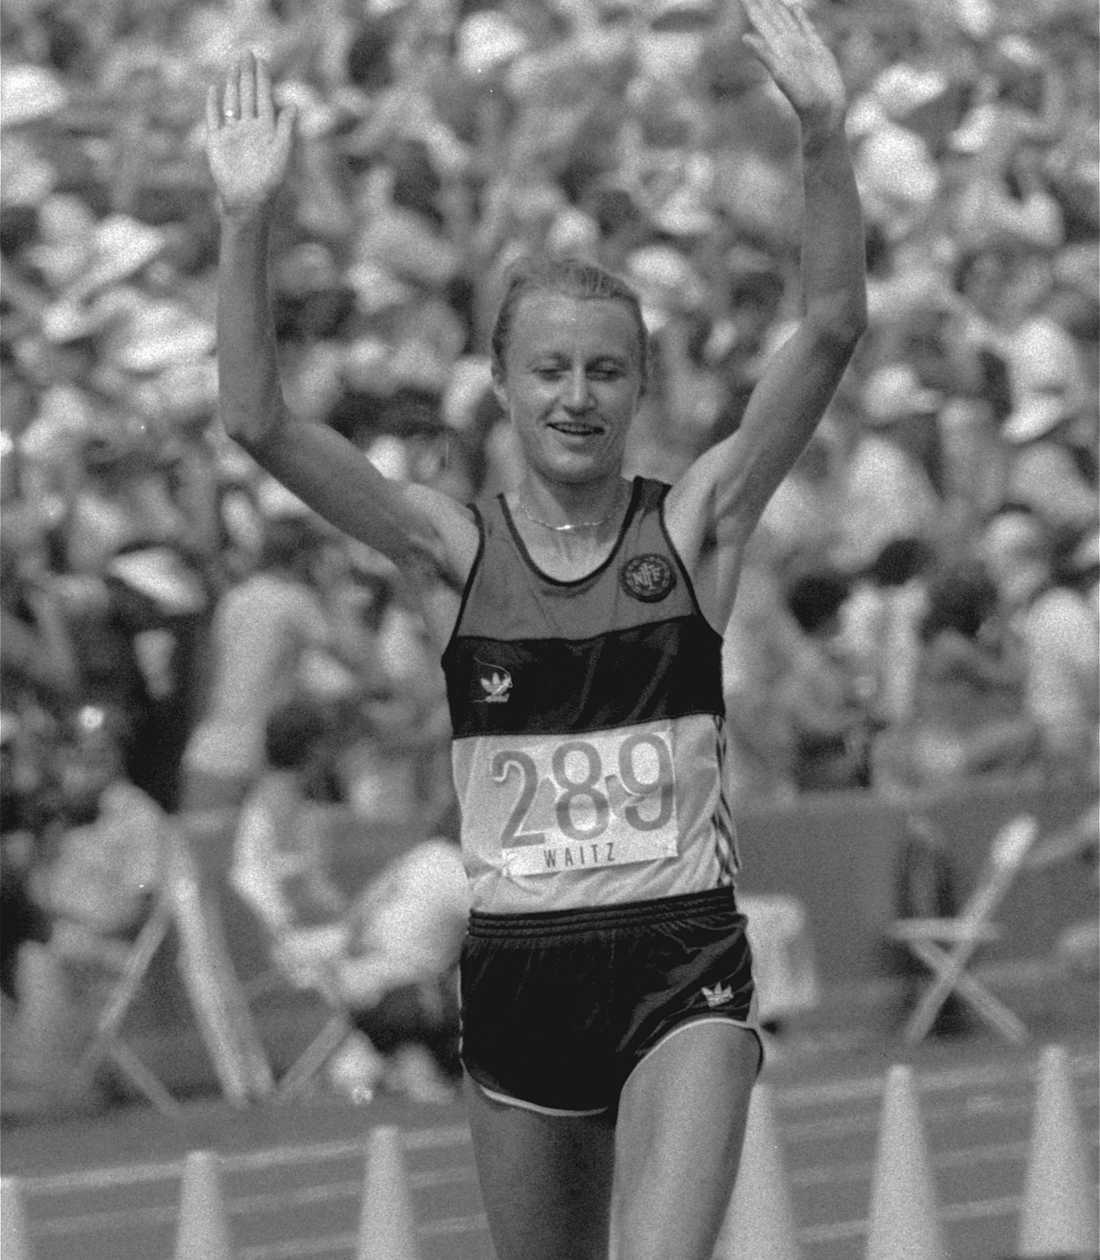 Waitz tog silver i OS i Los Angeles 1984.